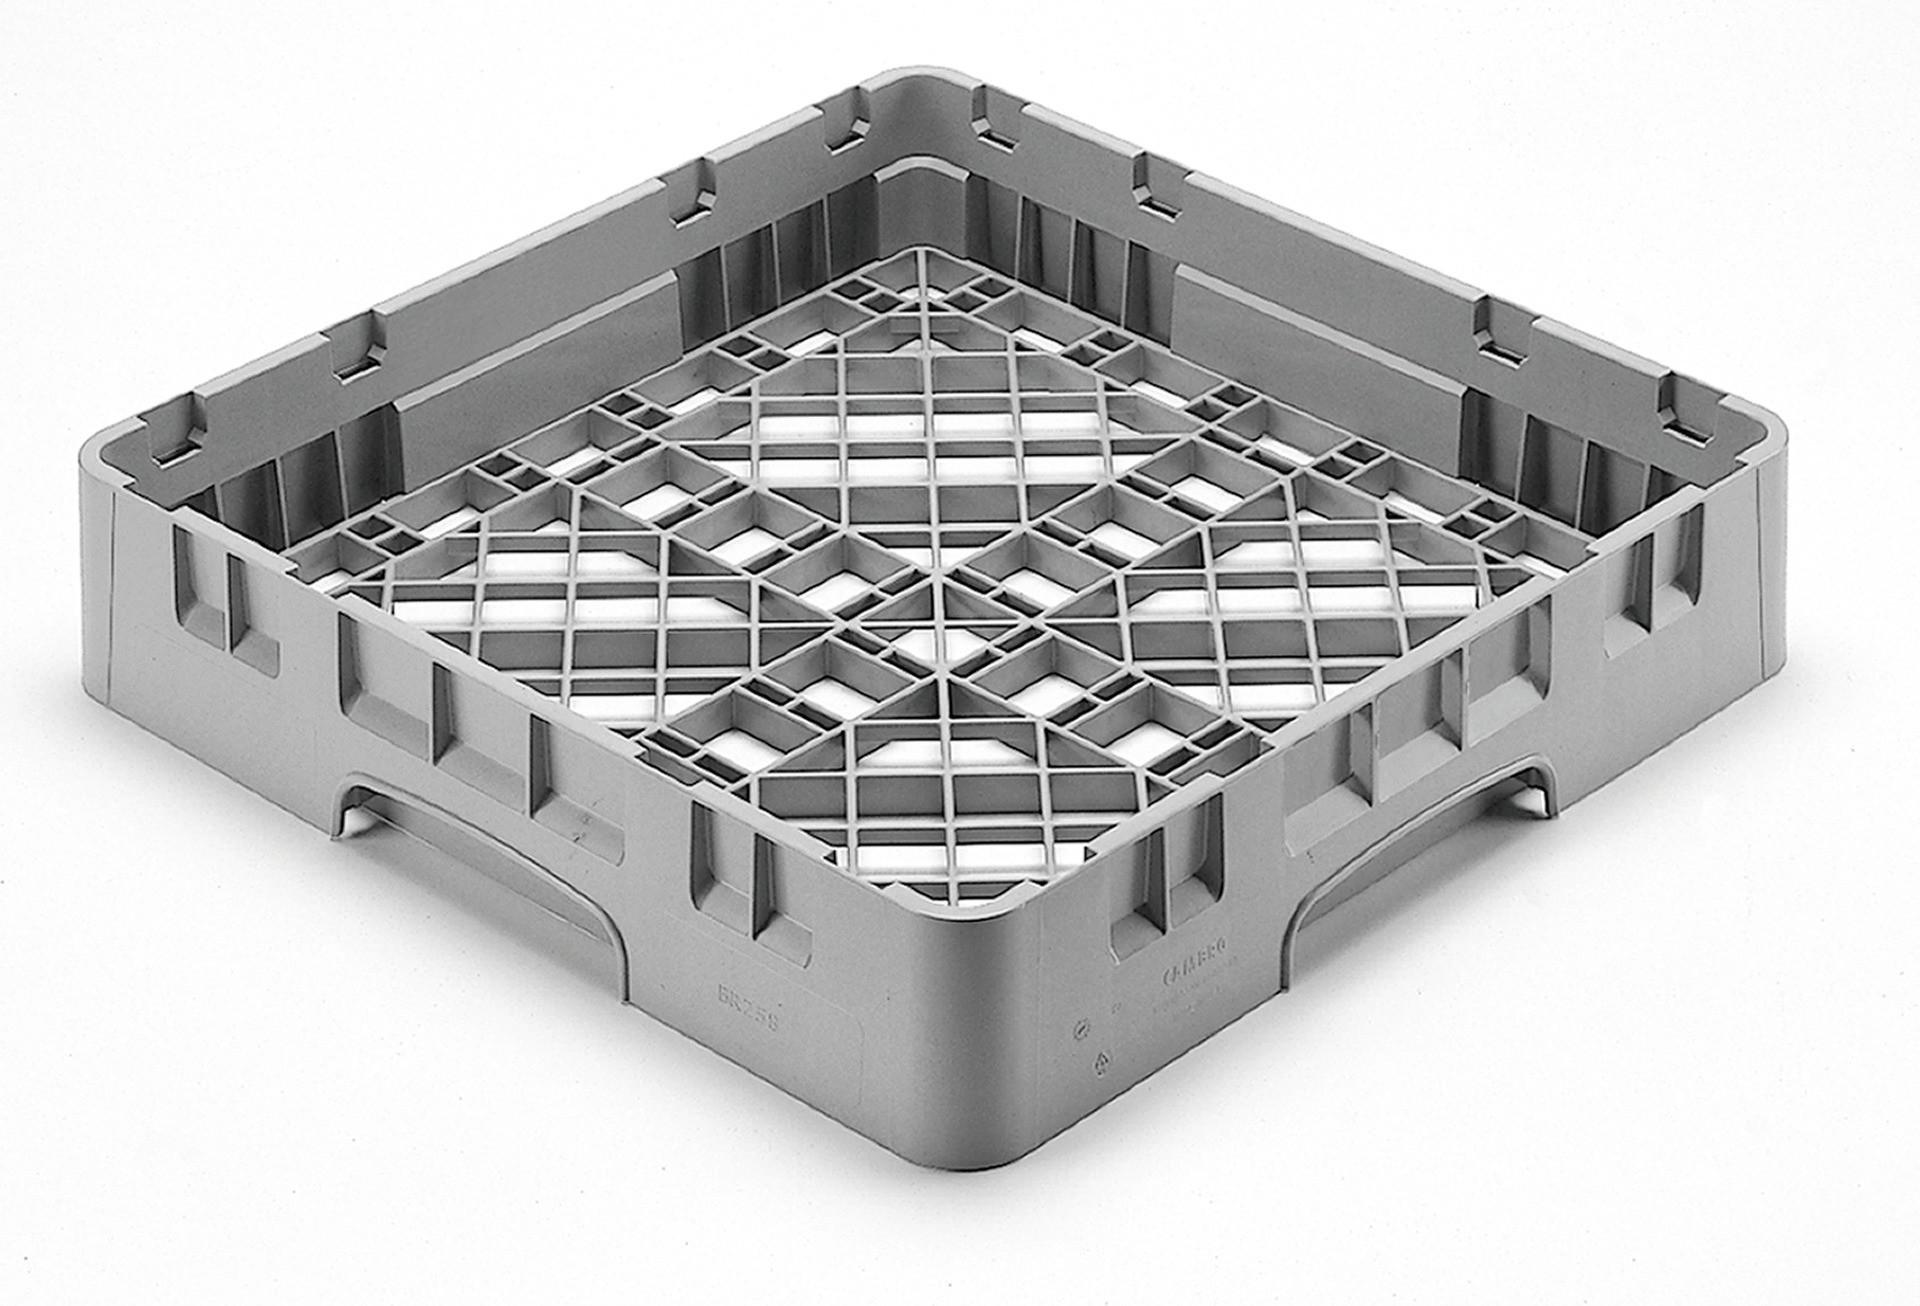 Basiskorb / Universalkorb für Großteile grobmaschiges Bodengitter